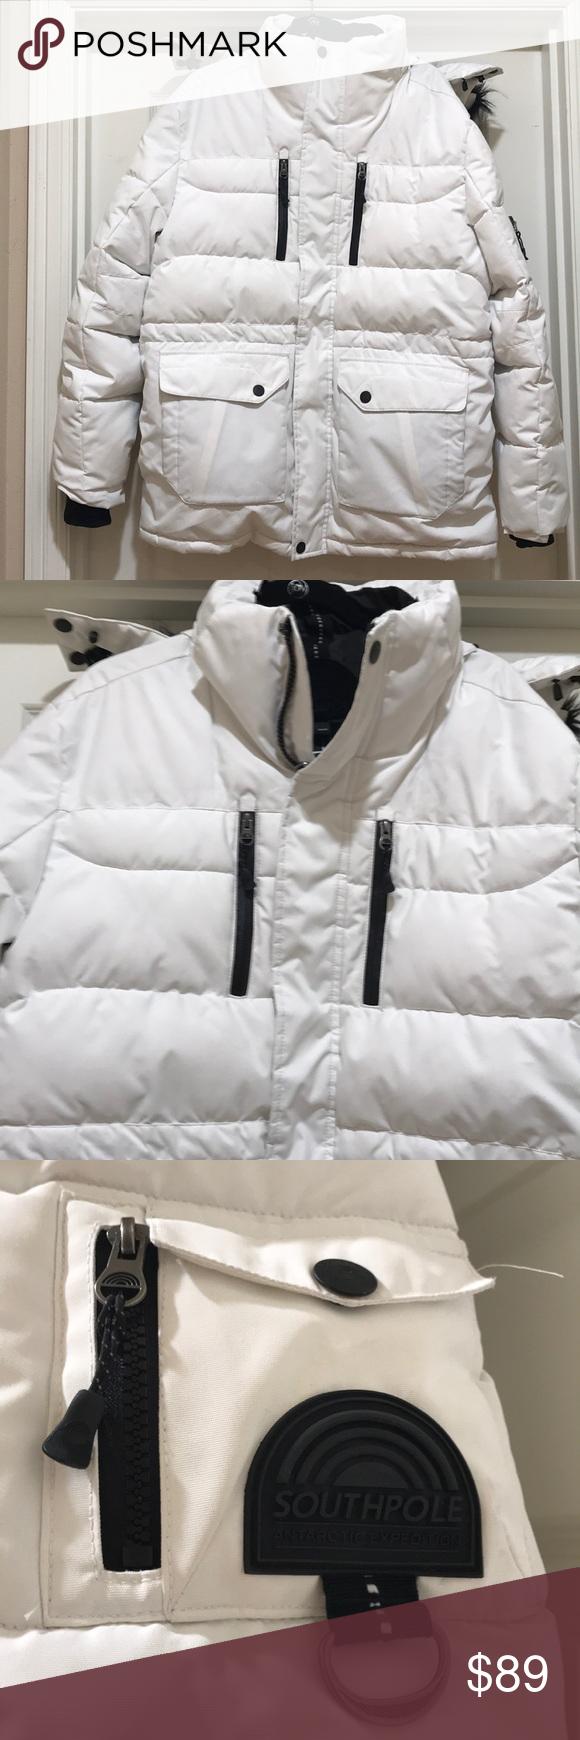 Like New Southpole White Puffer Jacket Size L White Puffer Jacket Puffer Jackets Jackets [ 1740 x 580 Pixel ]